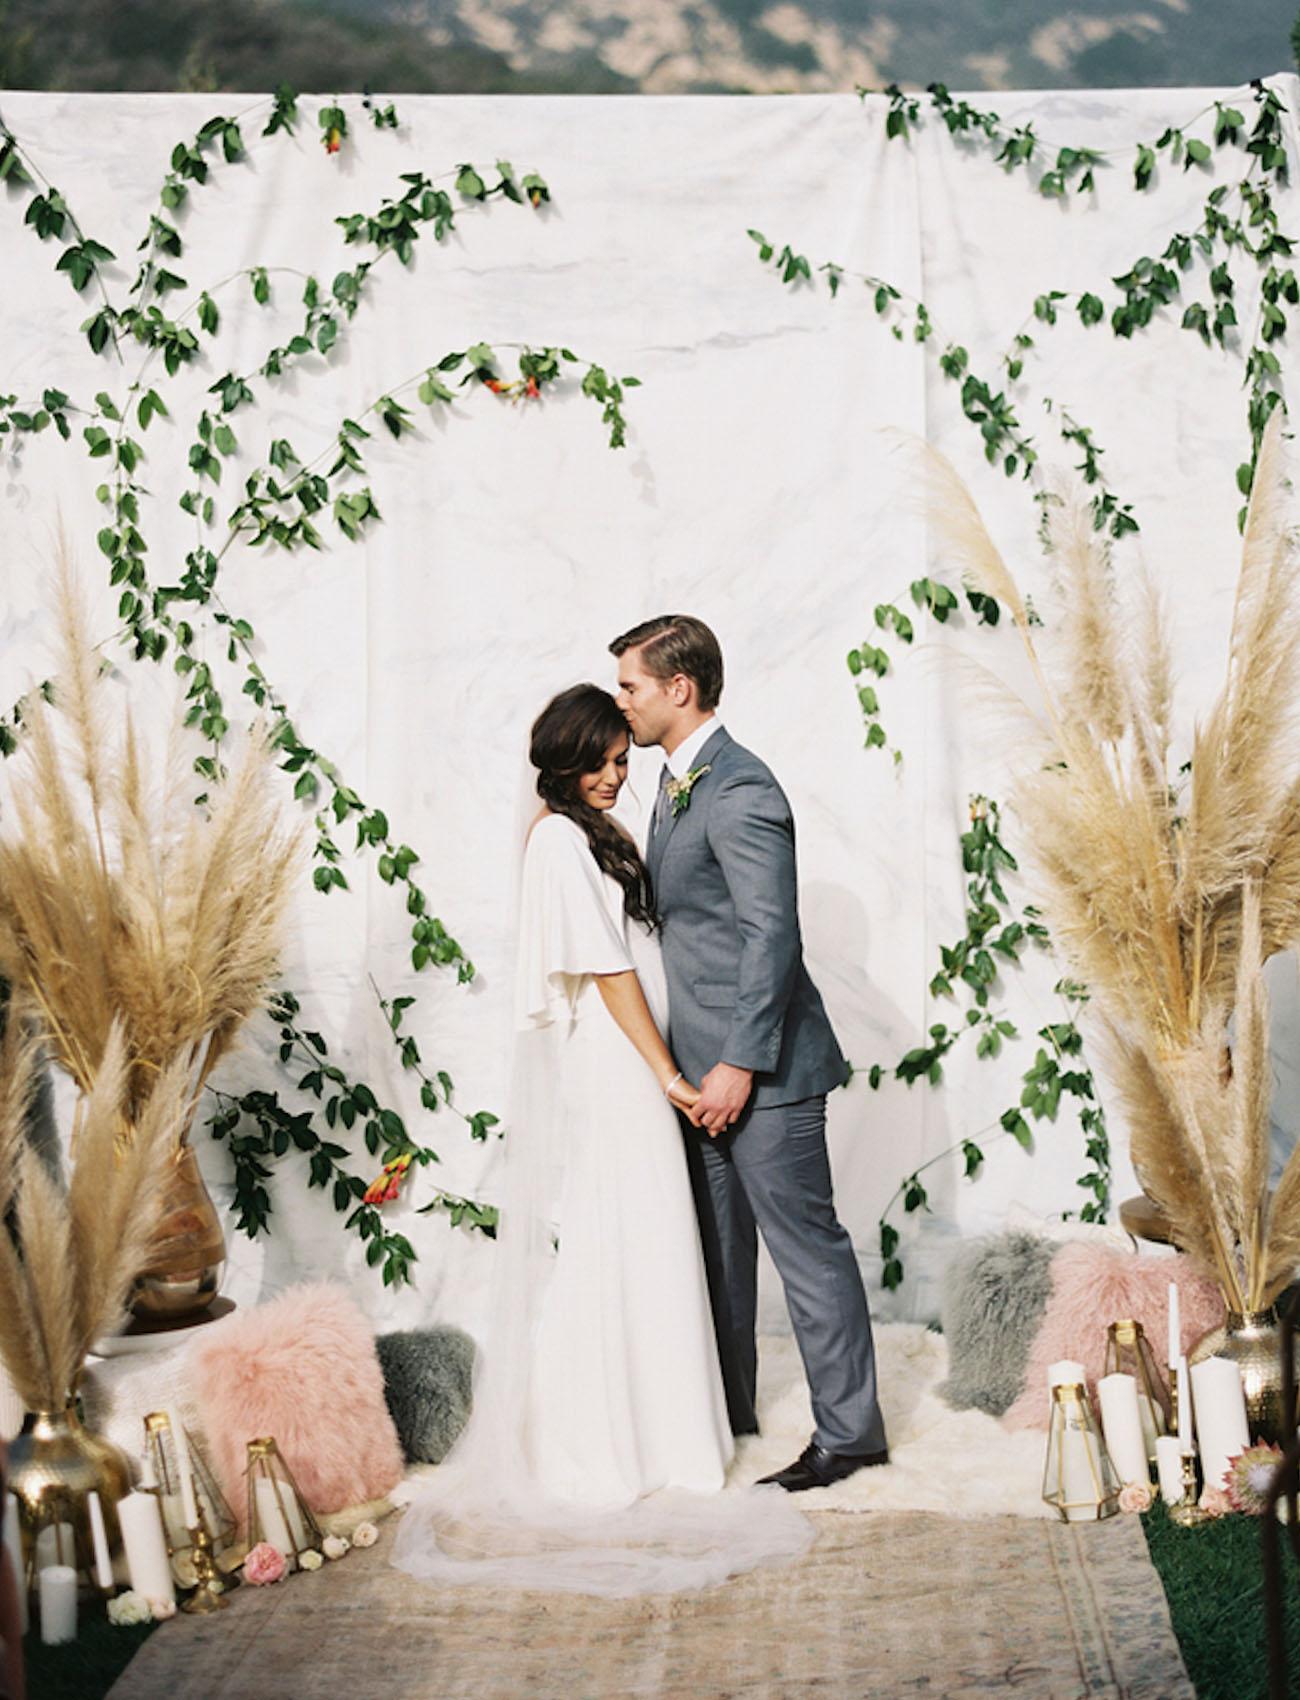 vine wall backdrop